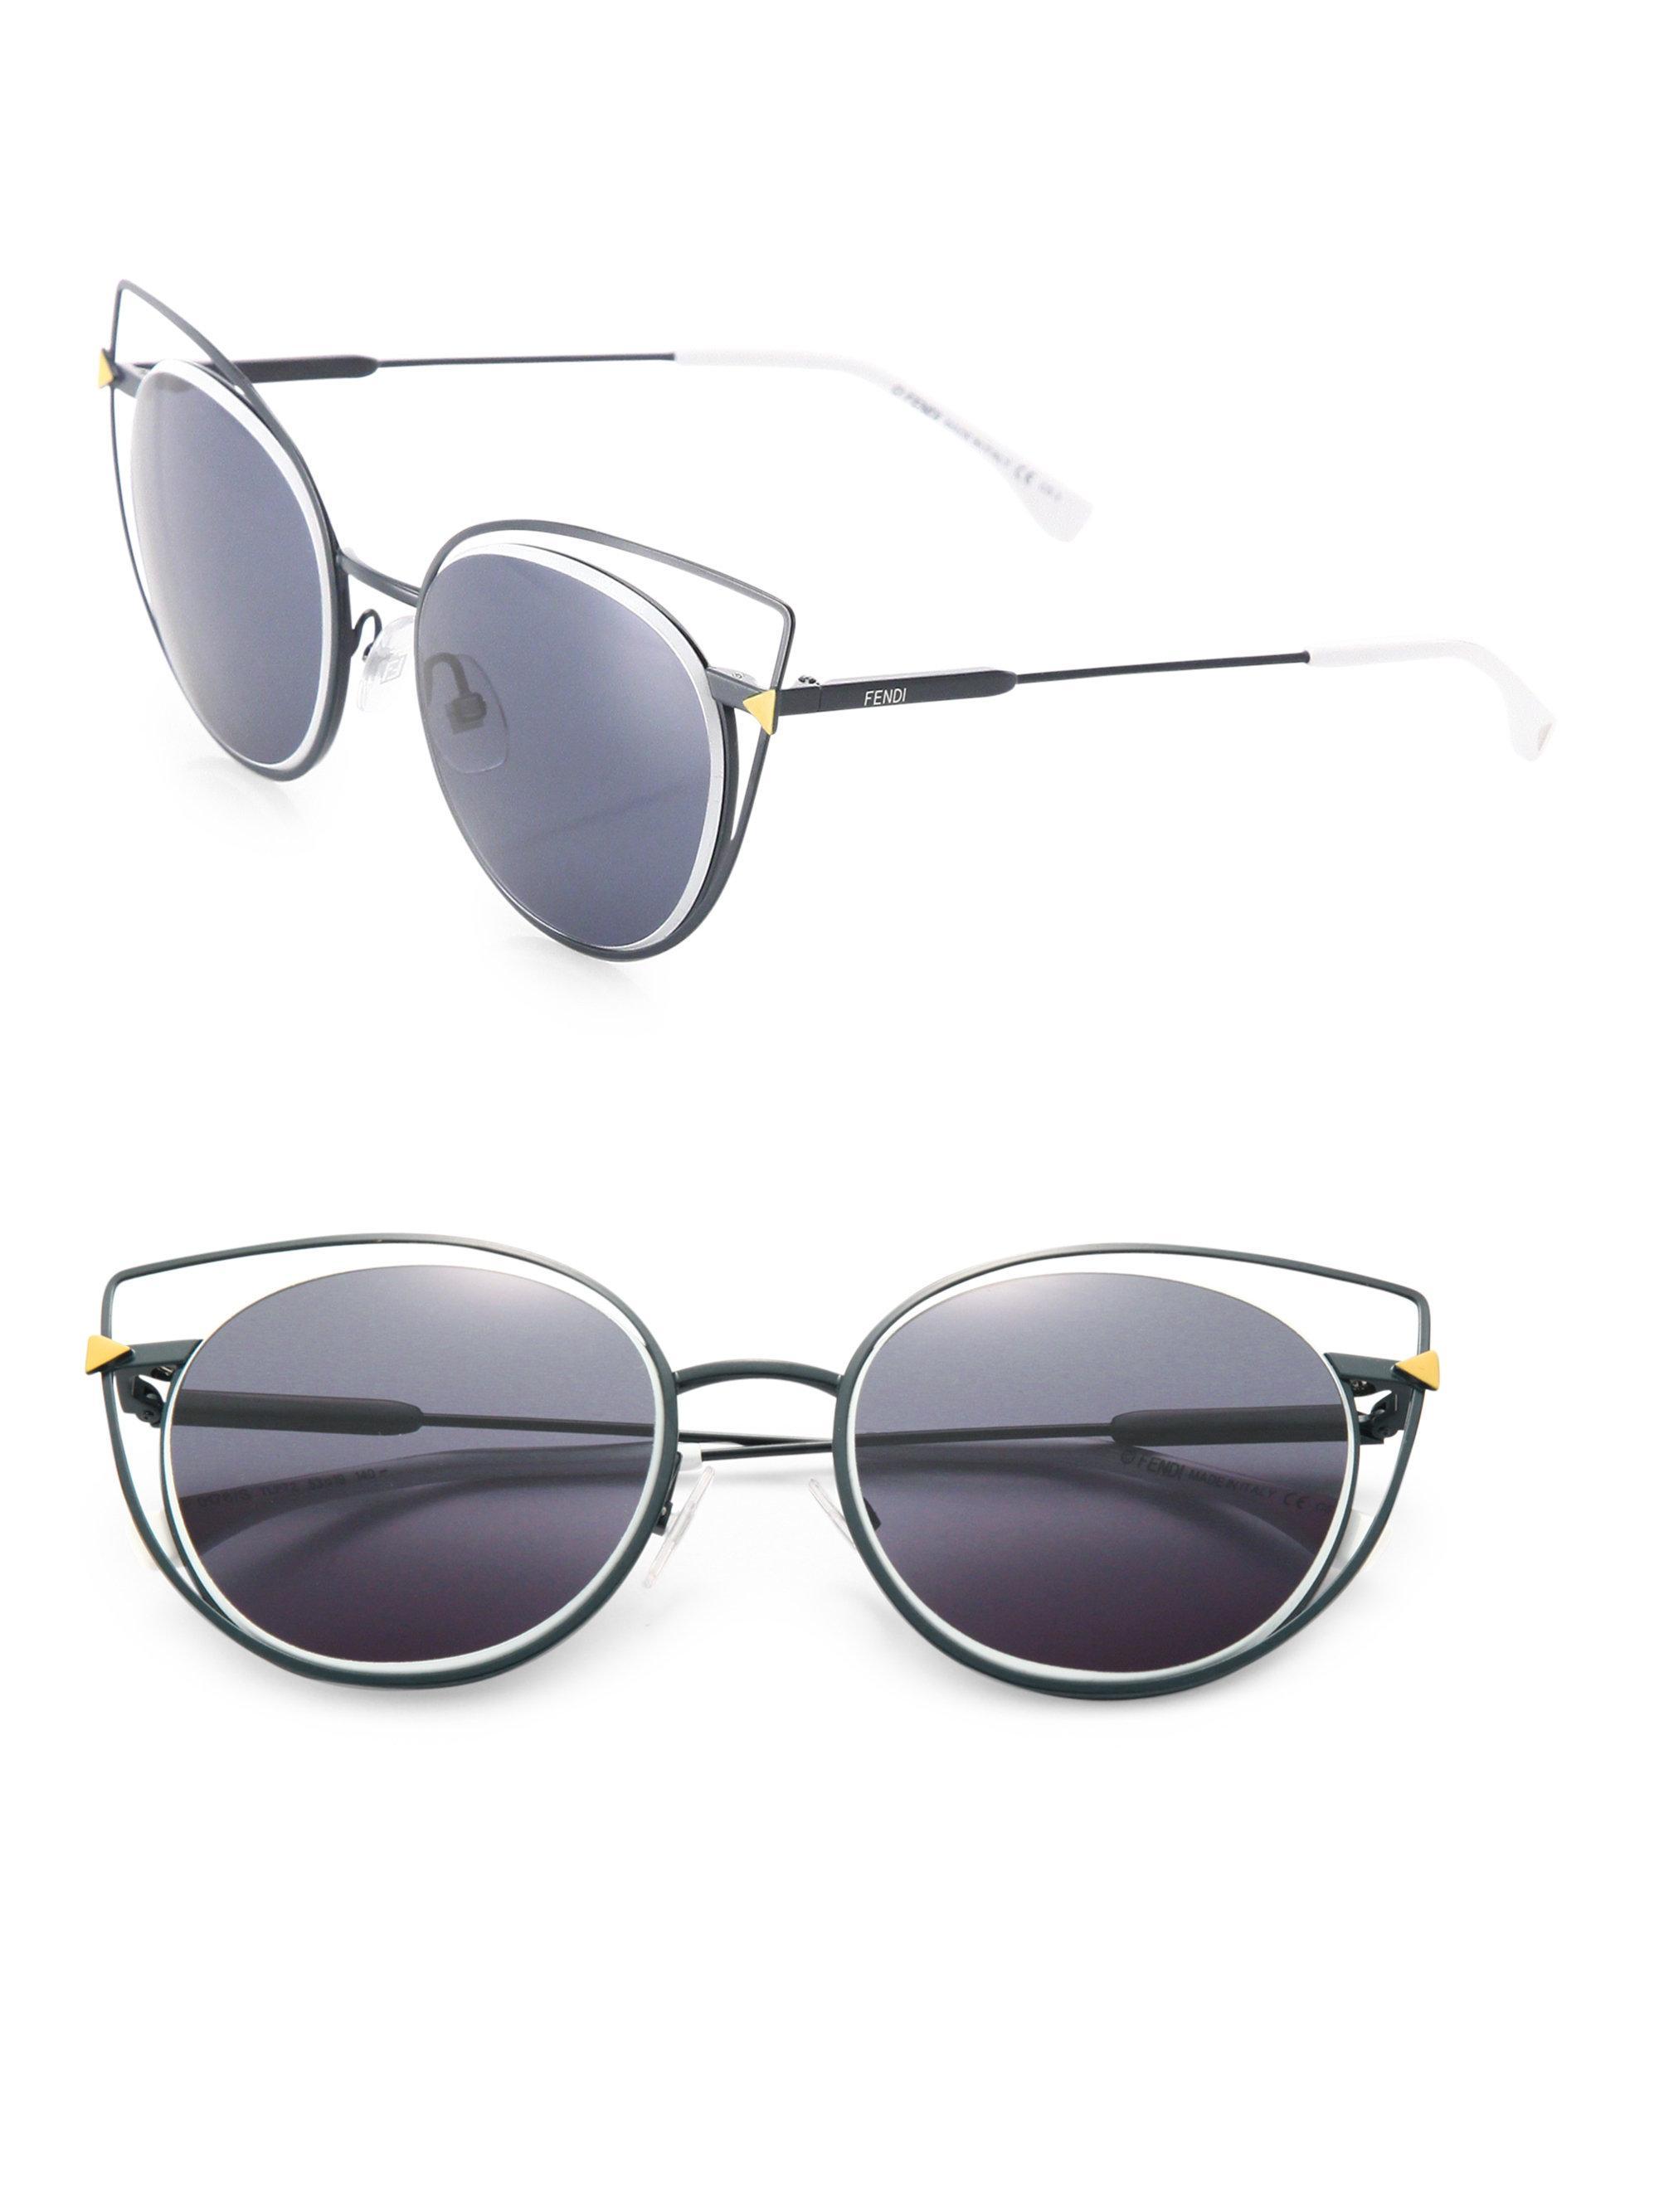 Lyst - Fendi 53mm Wired Cat Eye Frame Sunglasses in Blue